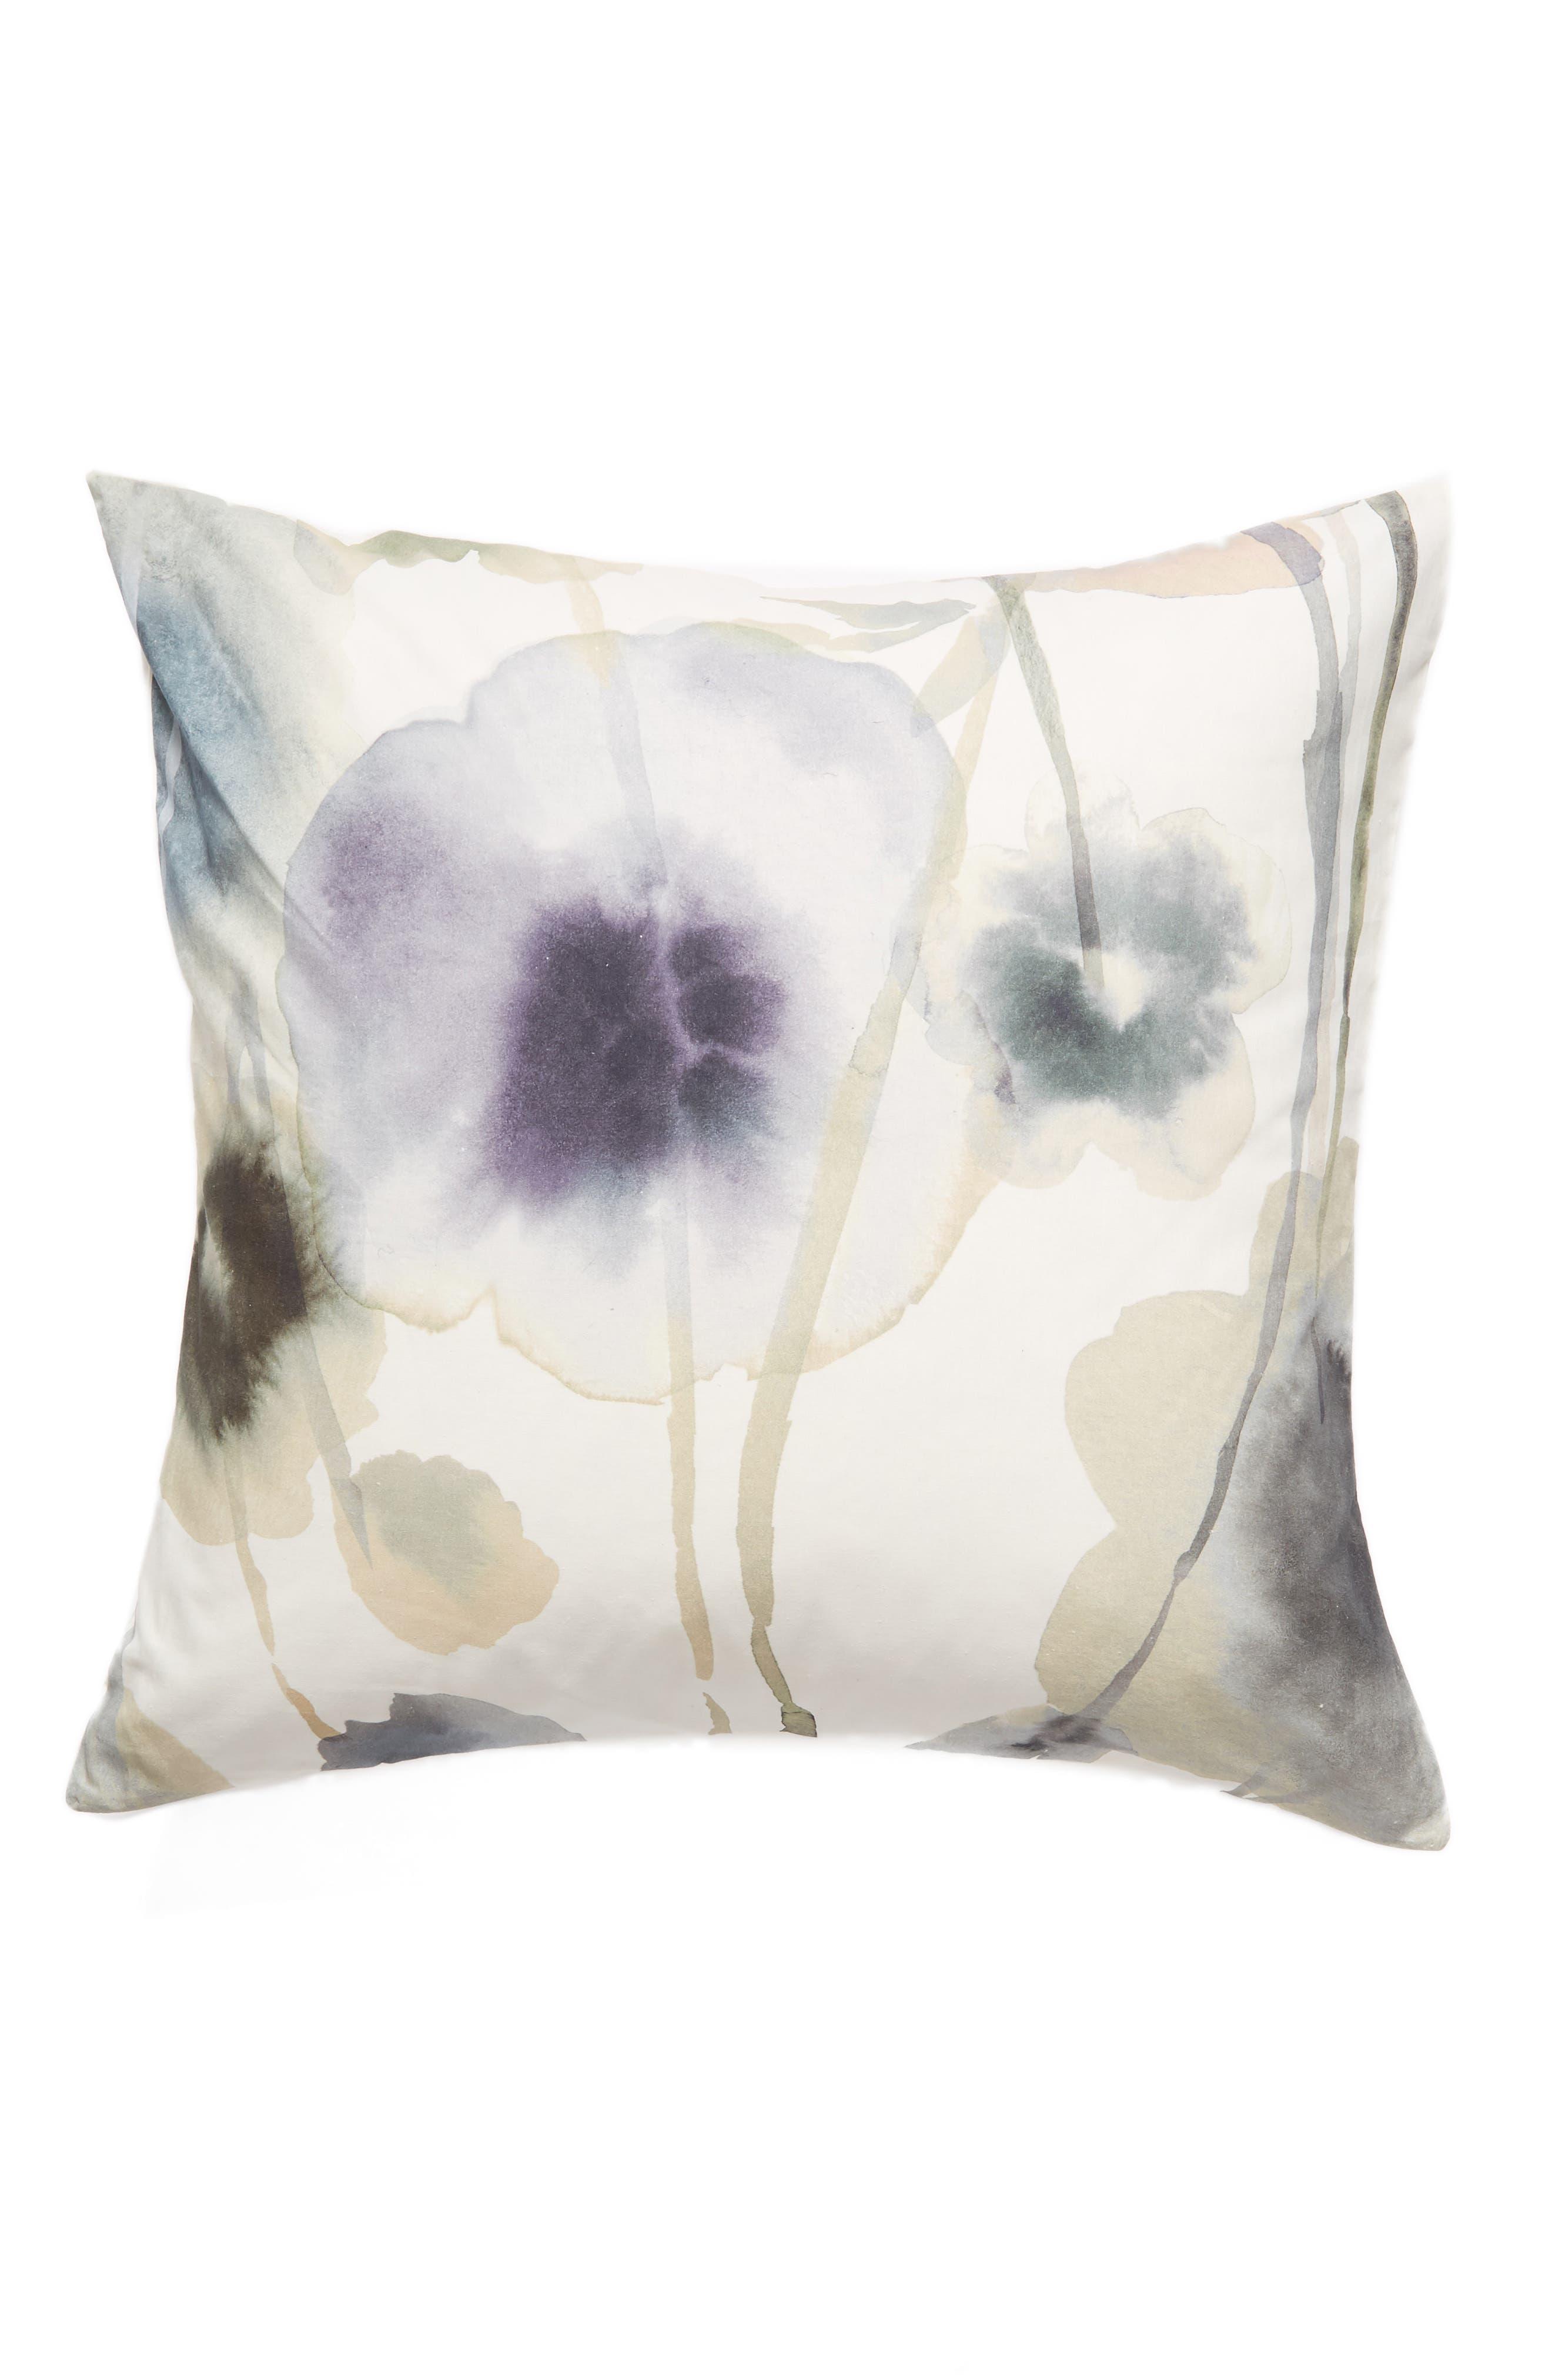 Floral Print Euro Sham,                         Main,                         color, WHITE WHISPER